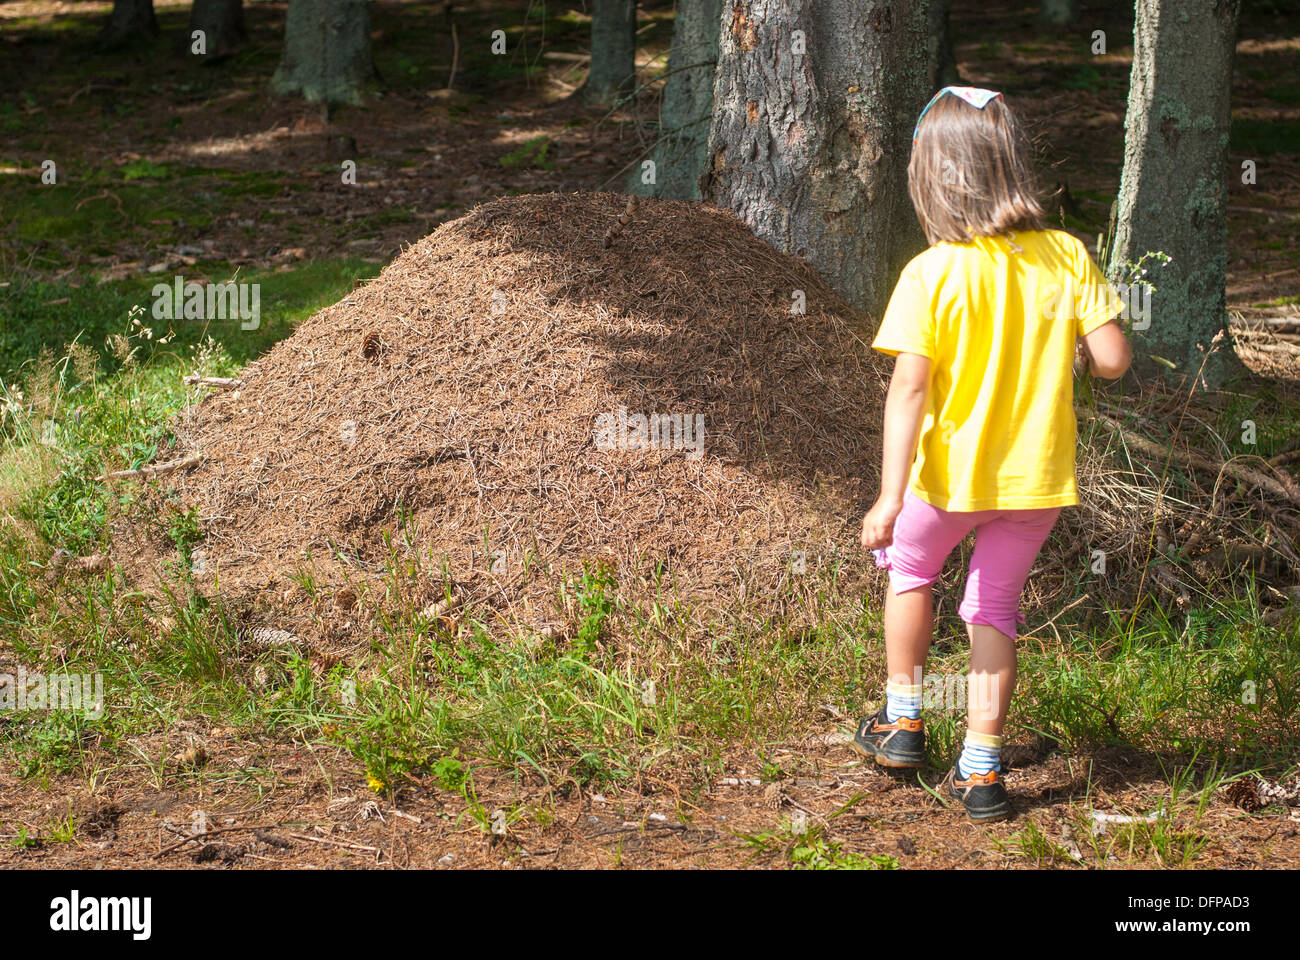 ant colony, Sumava Mts., Czech Republic - Stock Image